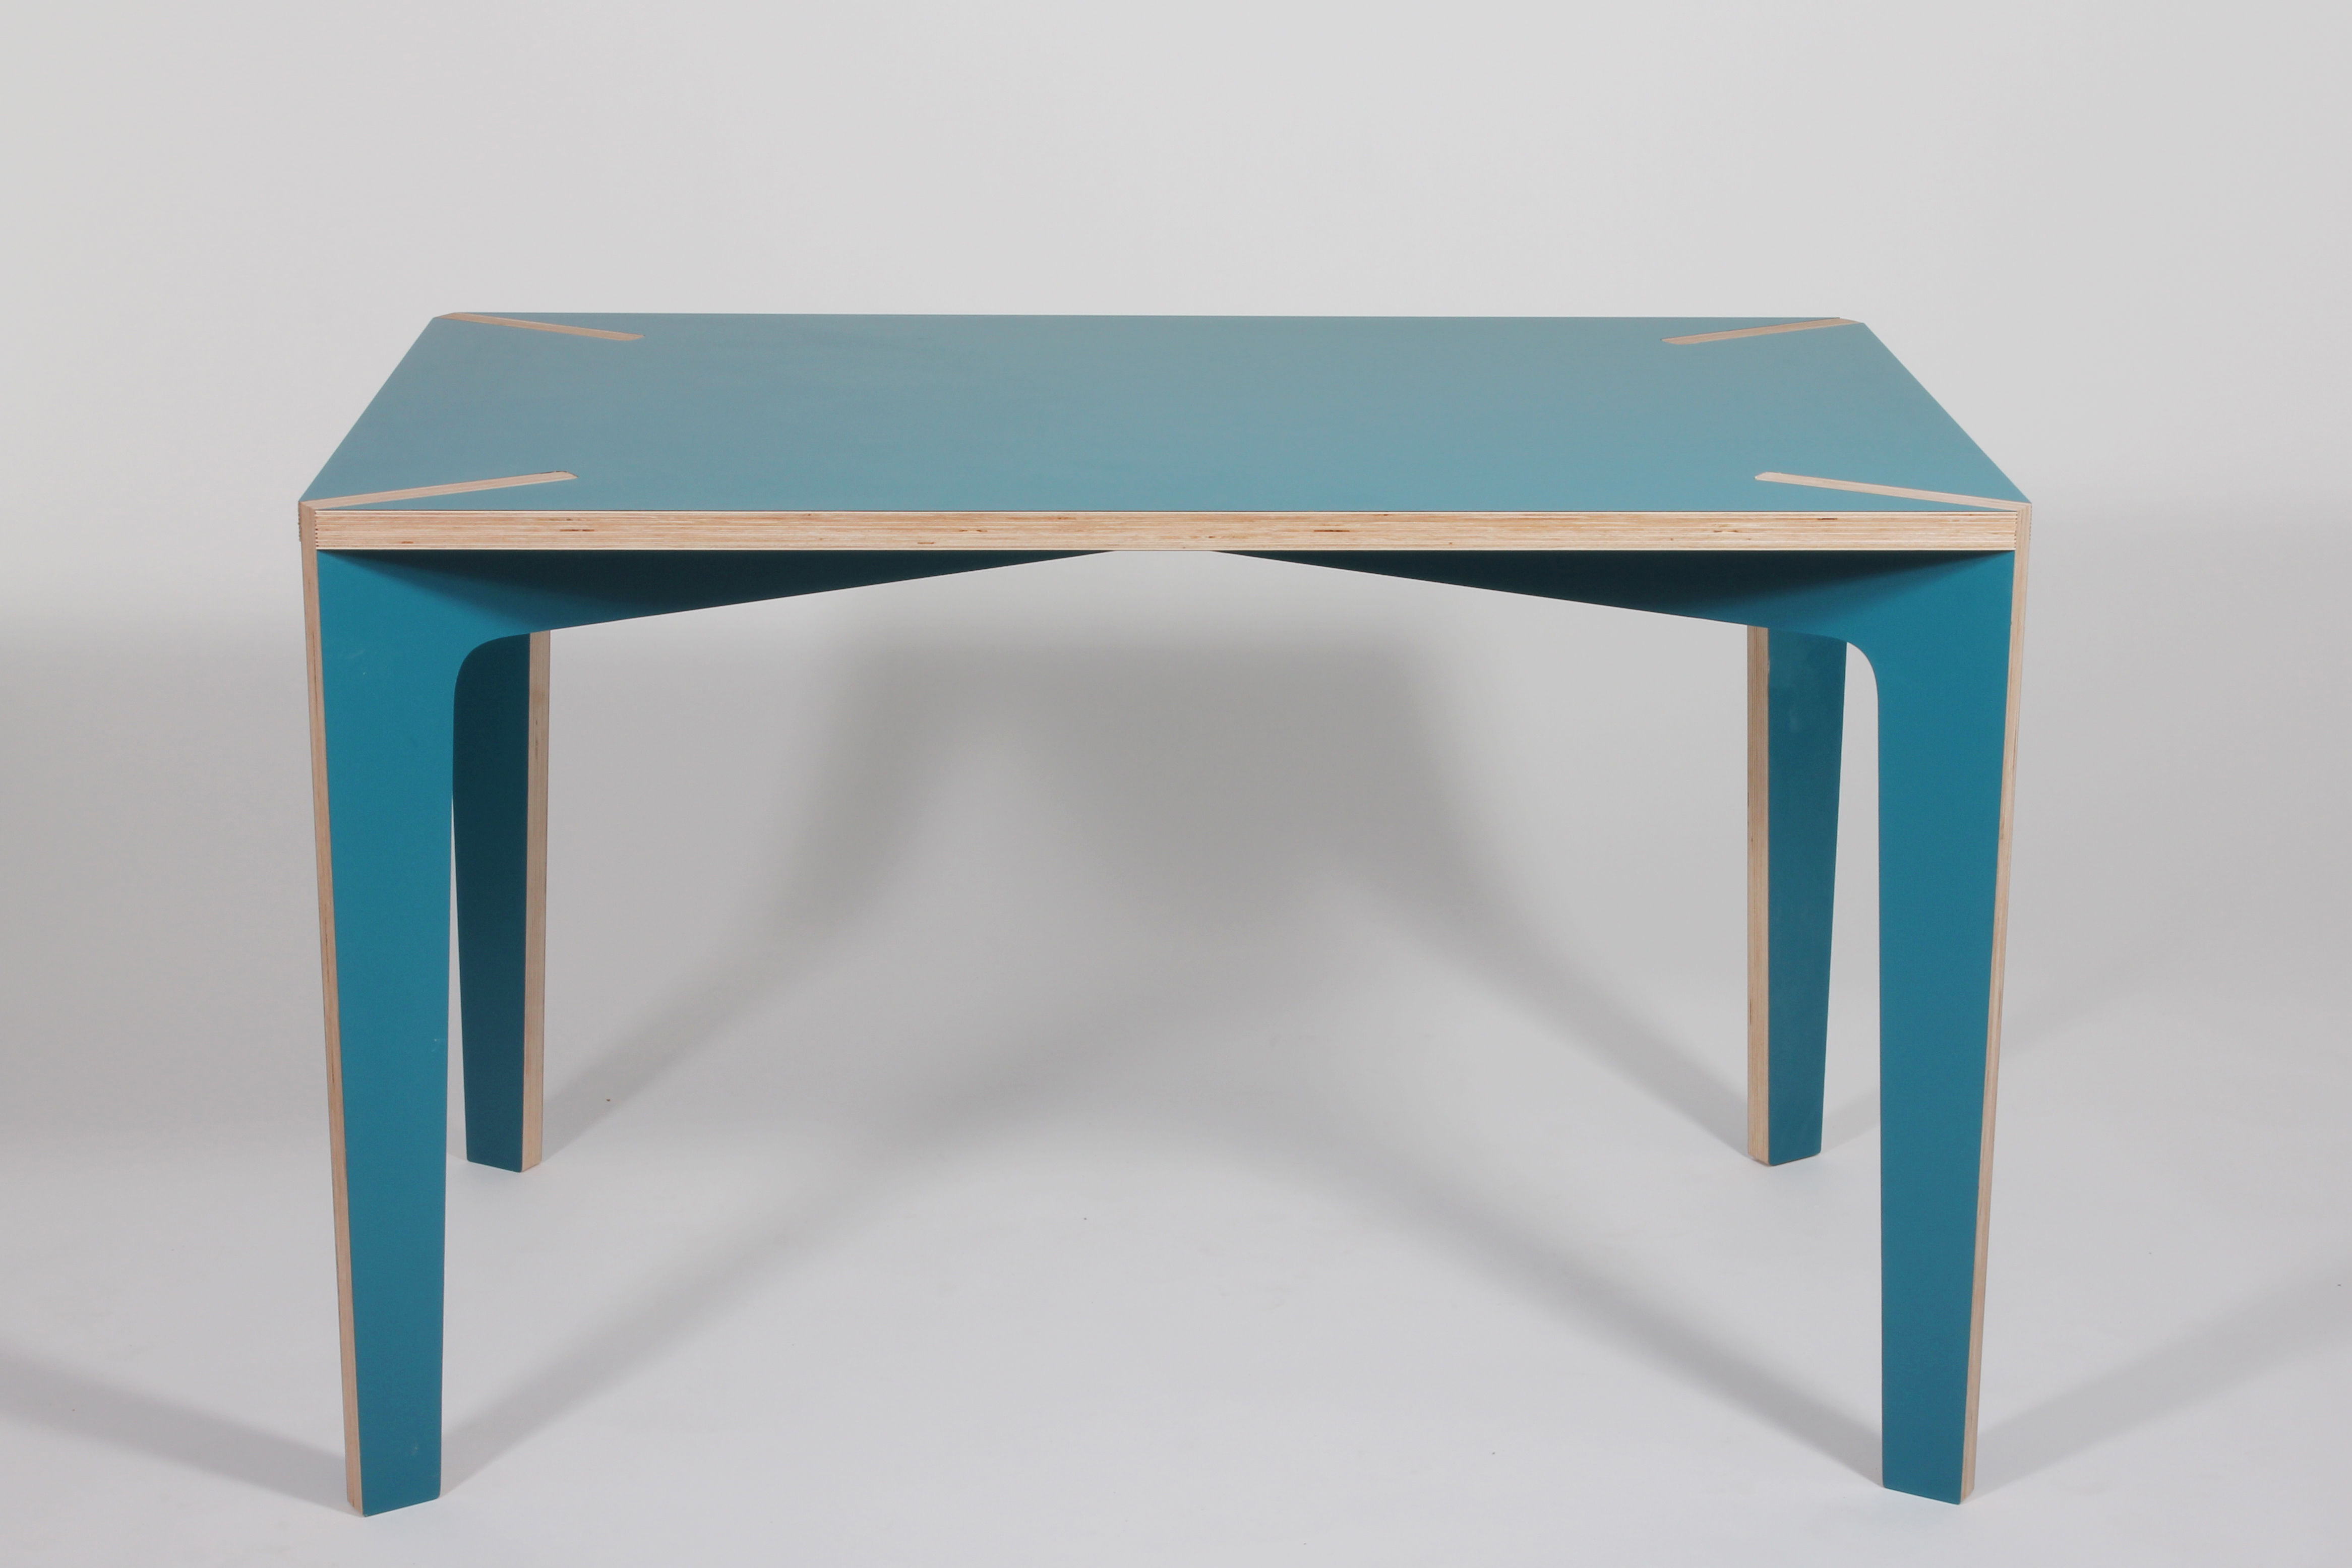 S rie x table table 120 x 75 cm 120 x 75 cm blue by la for Serie a table 99 00